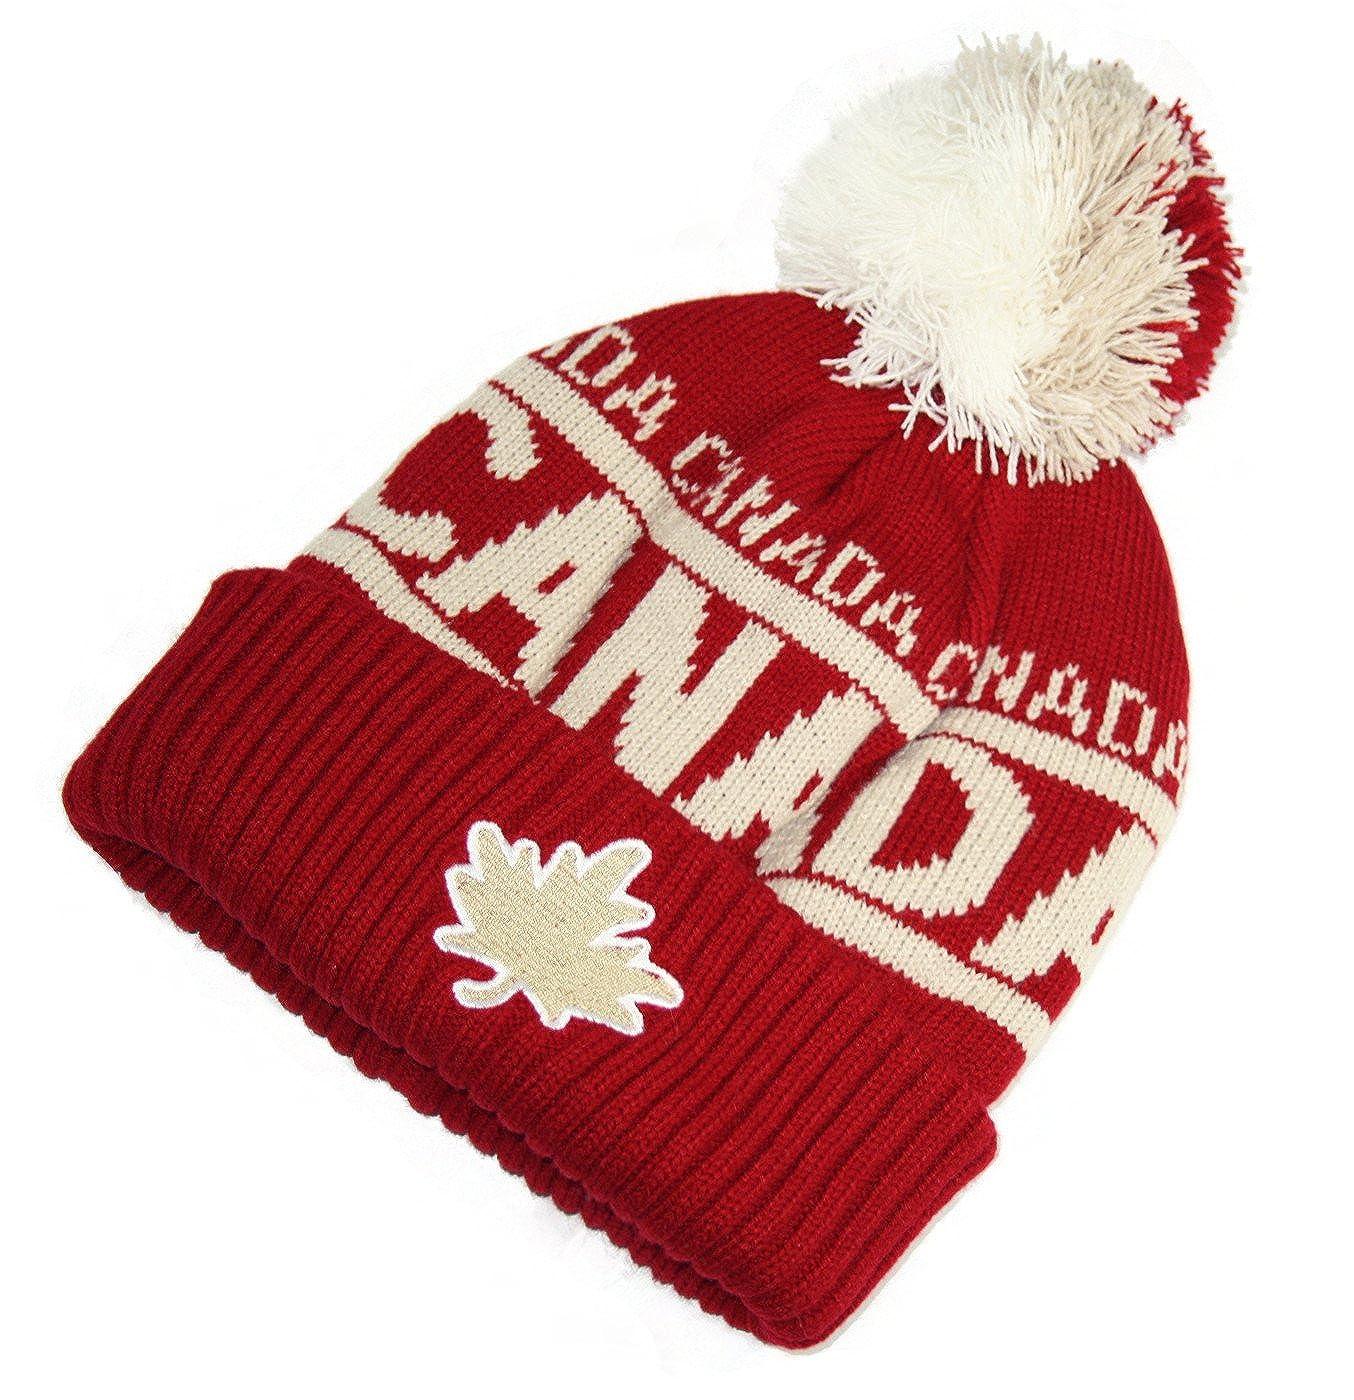 0f1703ff8 Vintage Canada Tuque Warm Winter Hat True North Travel - Maroon at ...